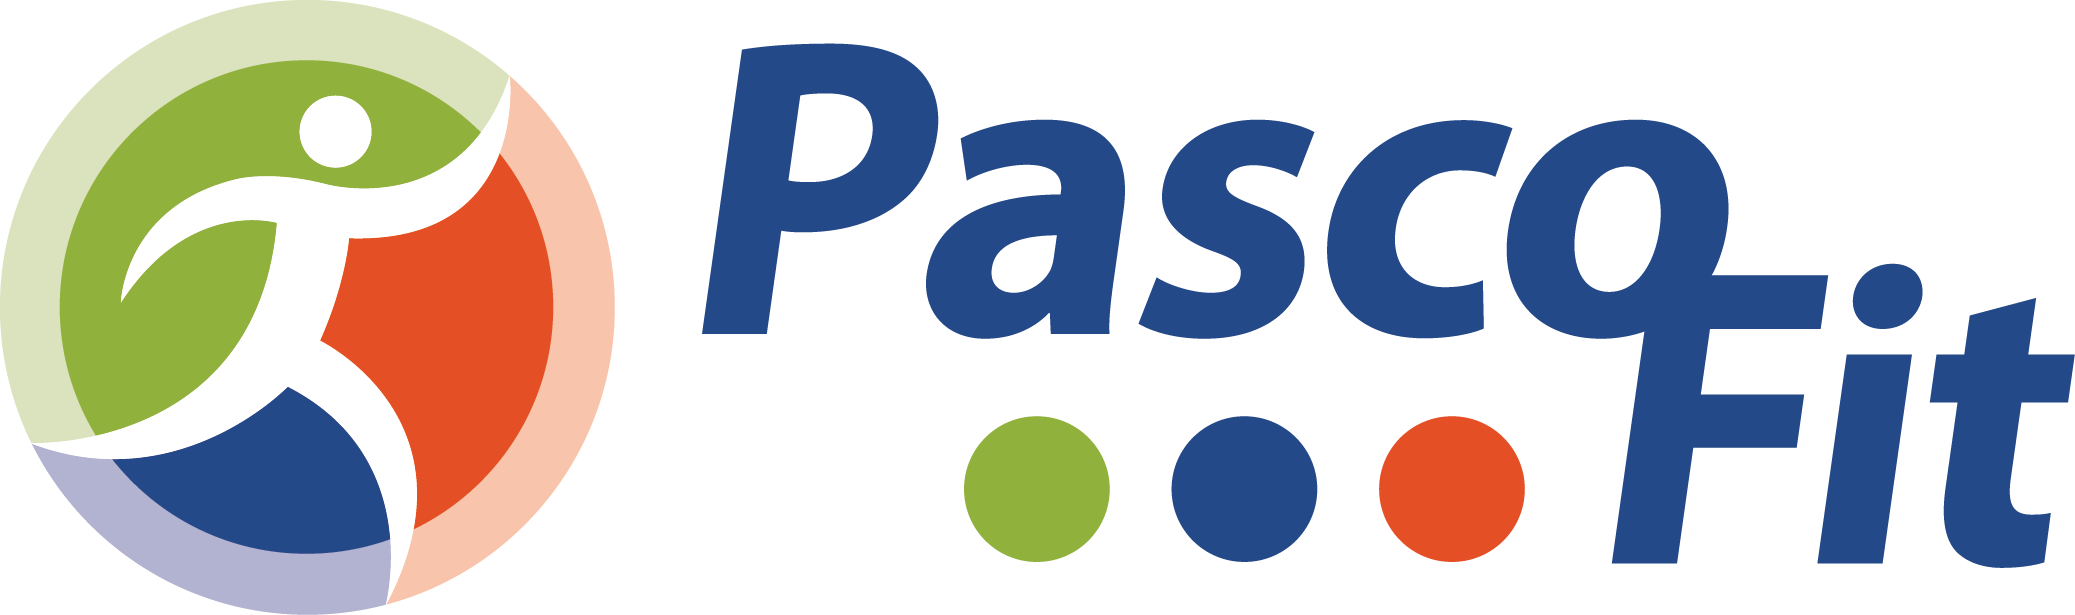 Health wellness program pasco. Motivation clipart incentive